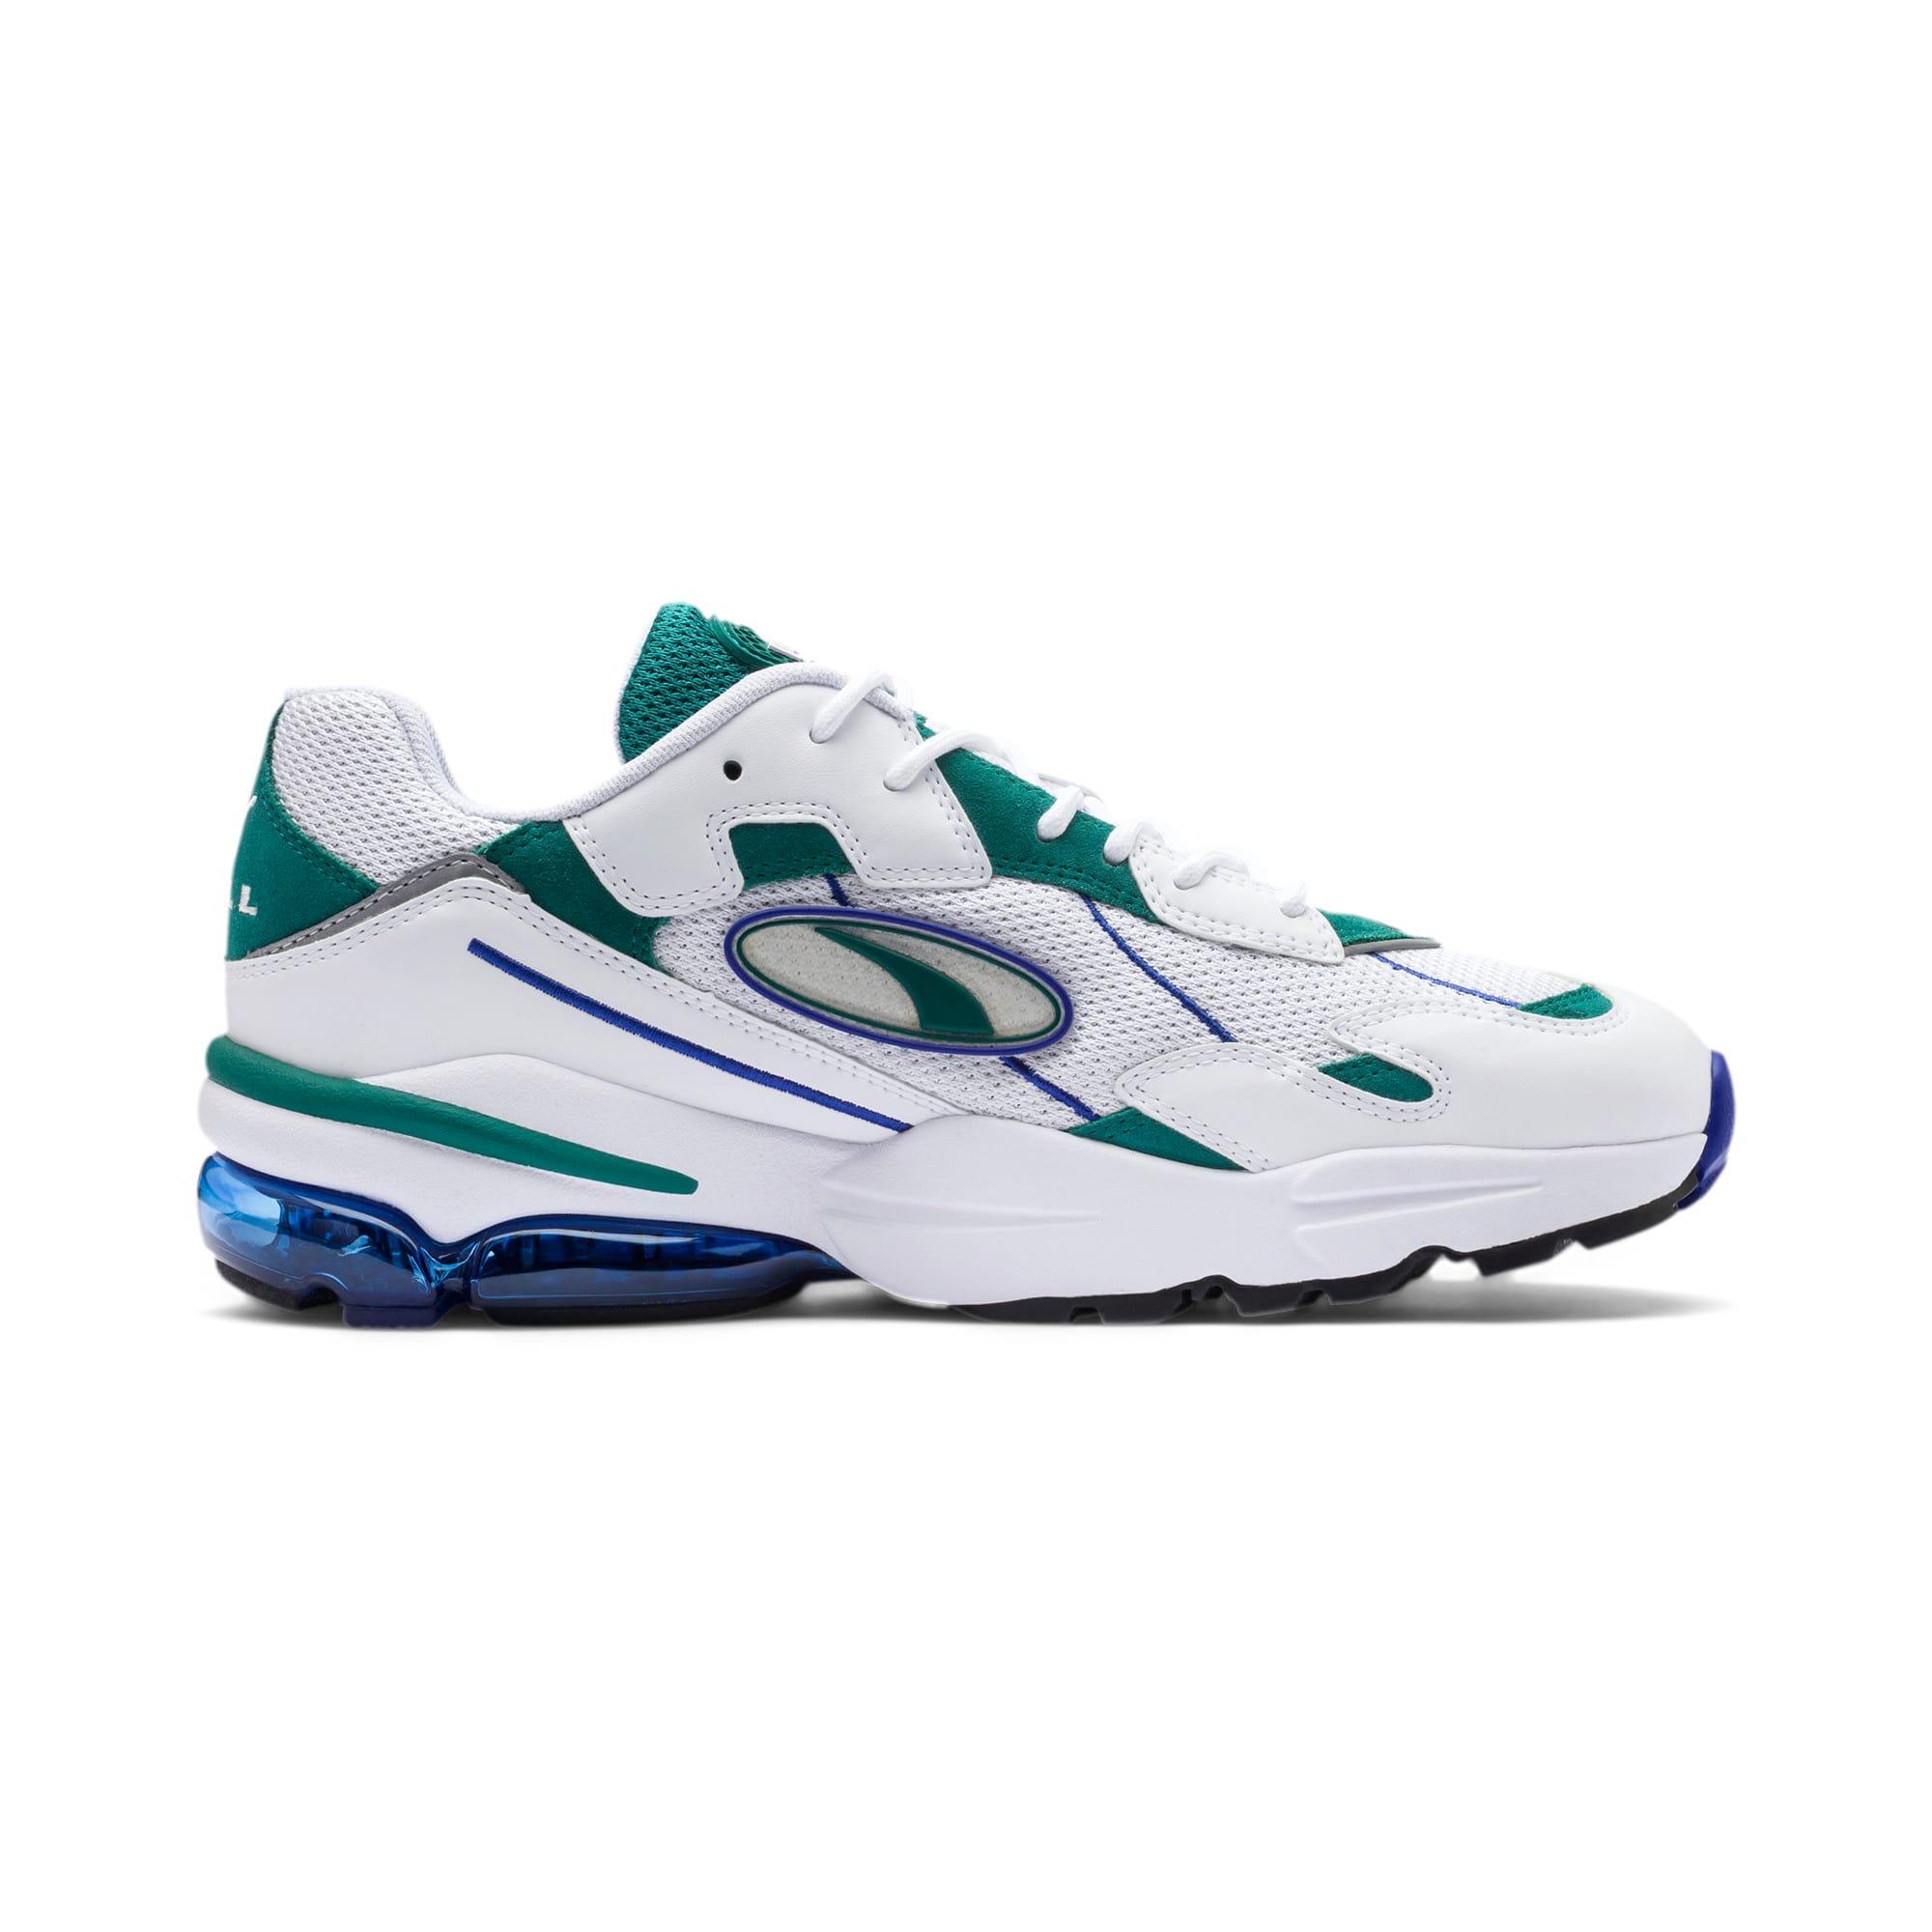 Thumbnail 6 of CELL Ultra OG Pack Sneakers, Puma White-Teal Green, medium